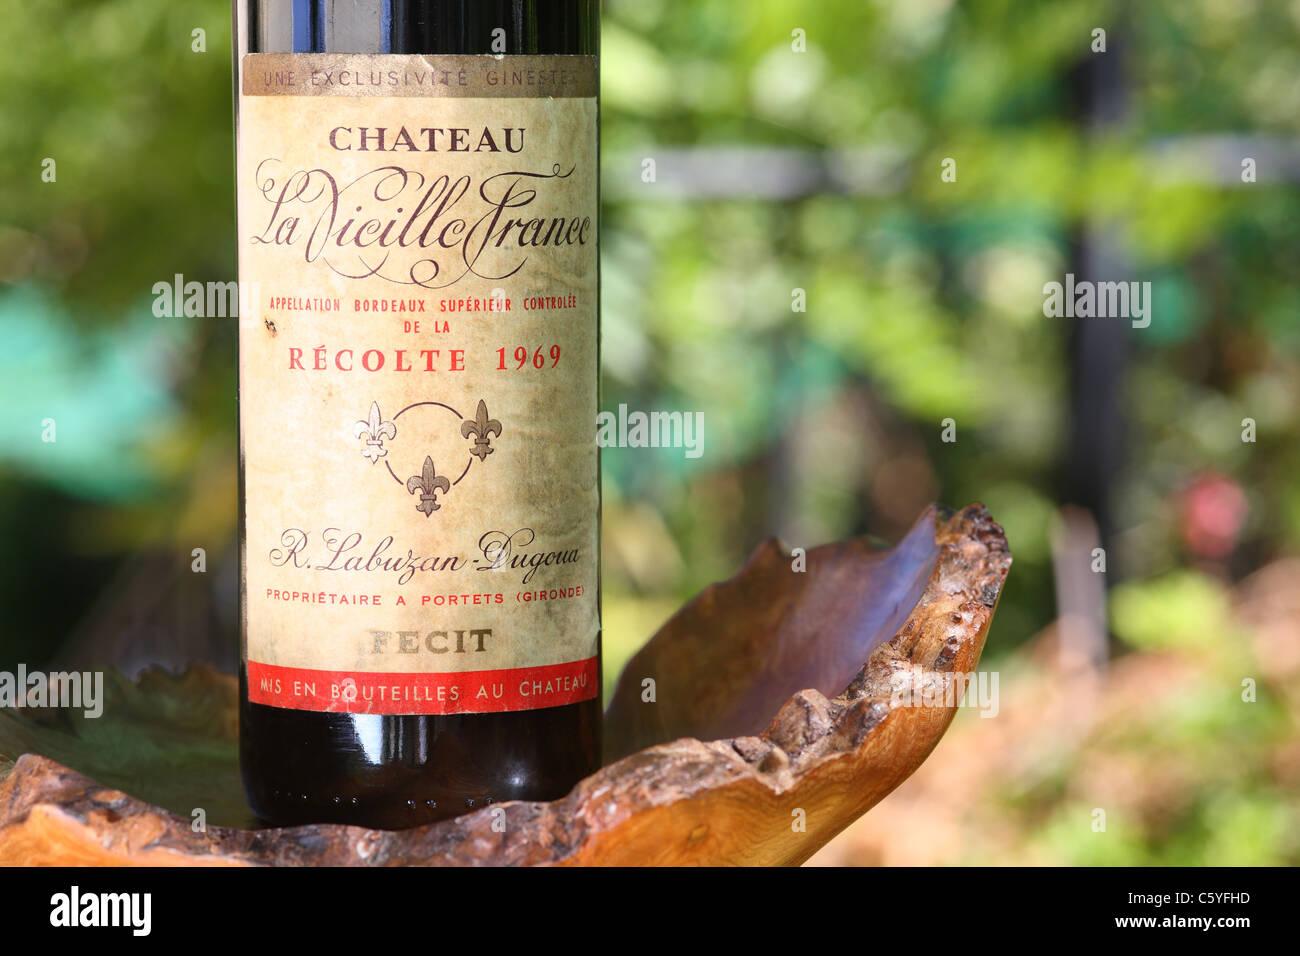 Old Bordeaux wine bottle - Stock Image